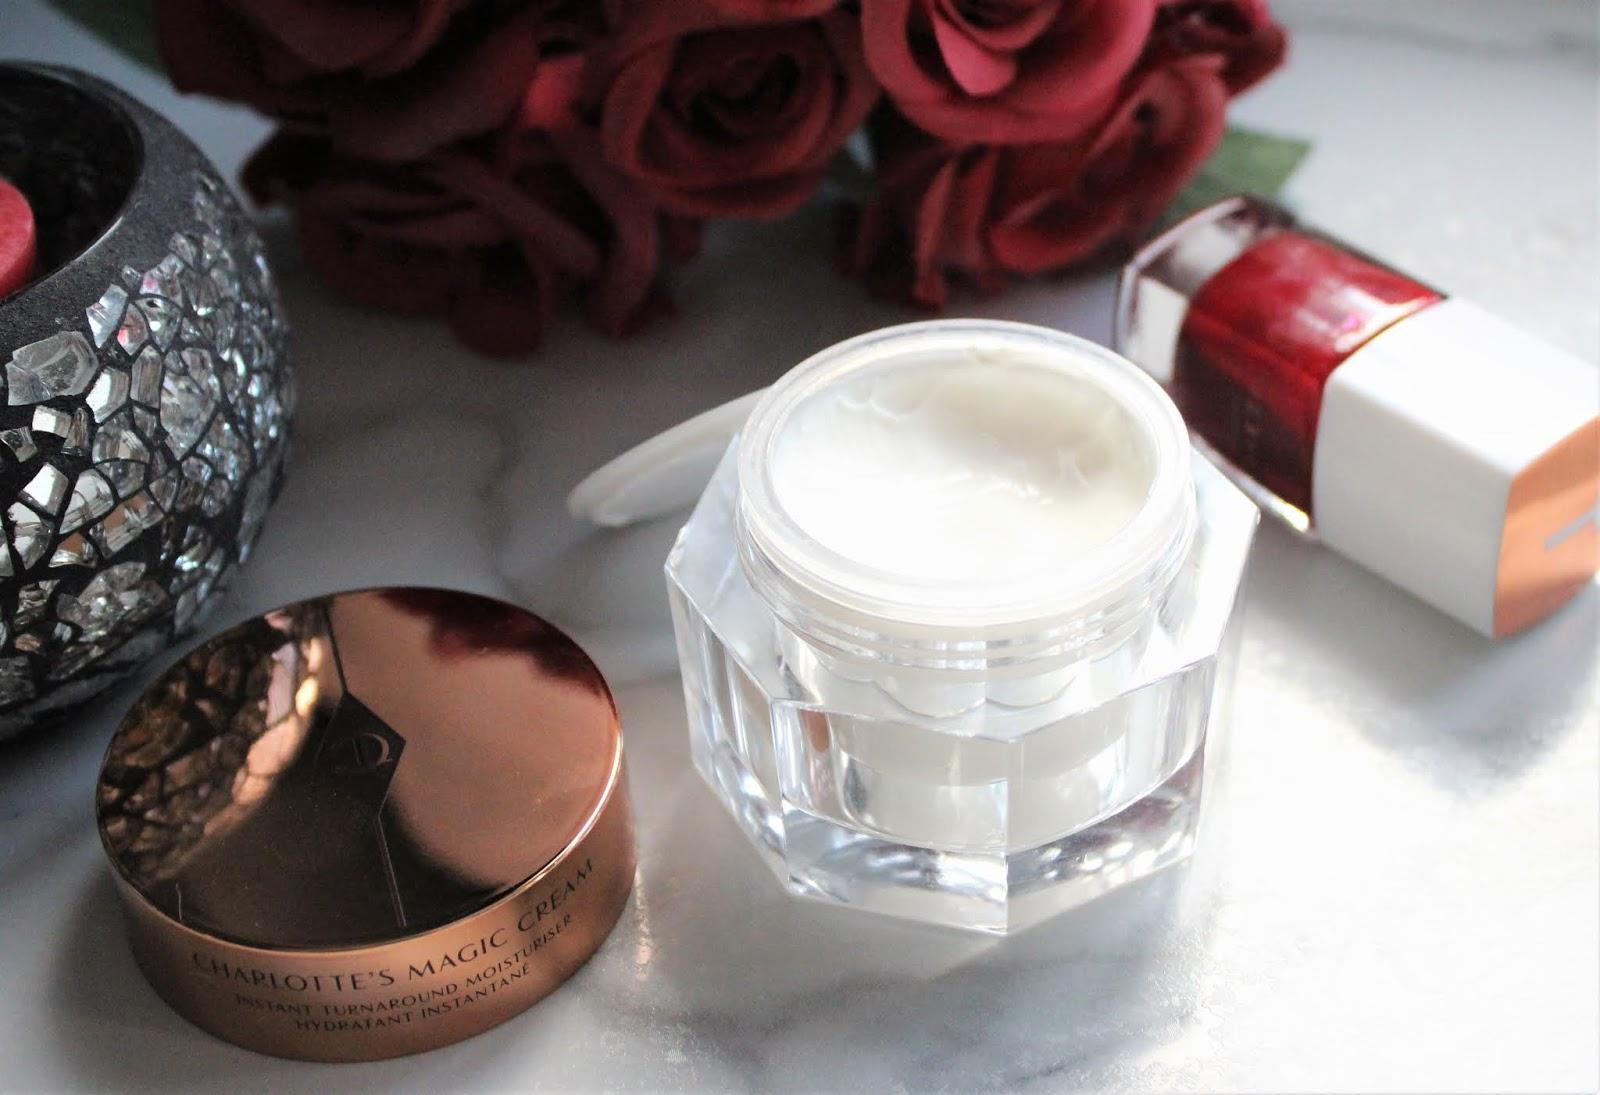 charlottes magic cream blog review